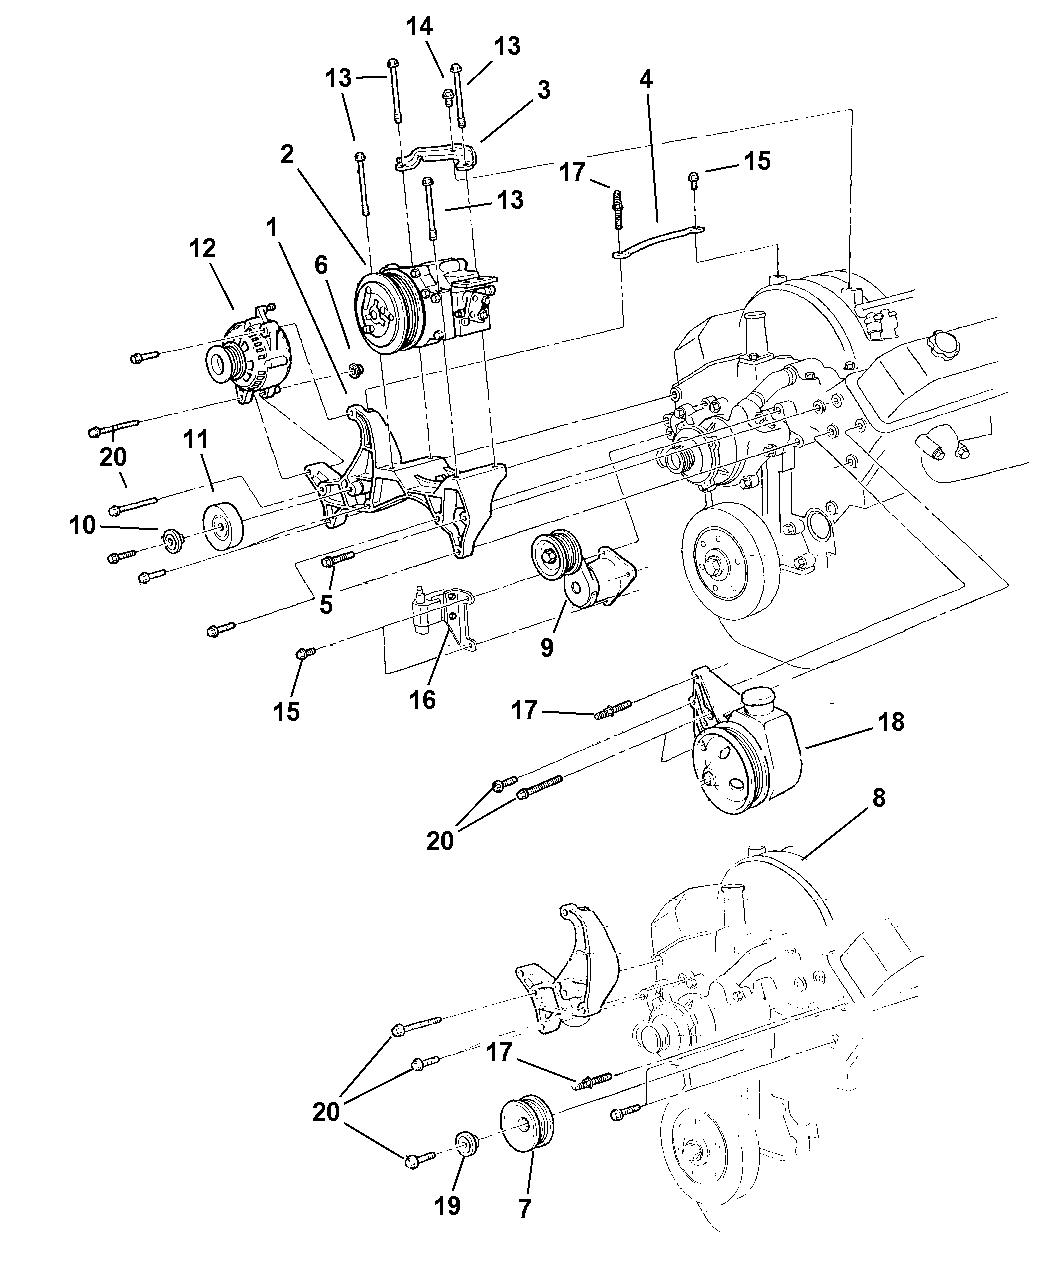 1999 Dodge Durango Alternator & Mounting